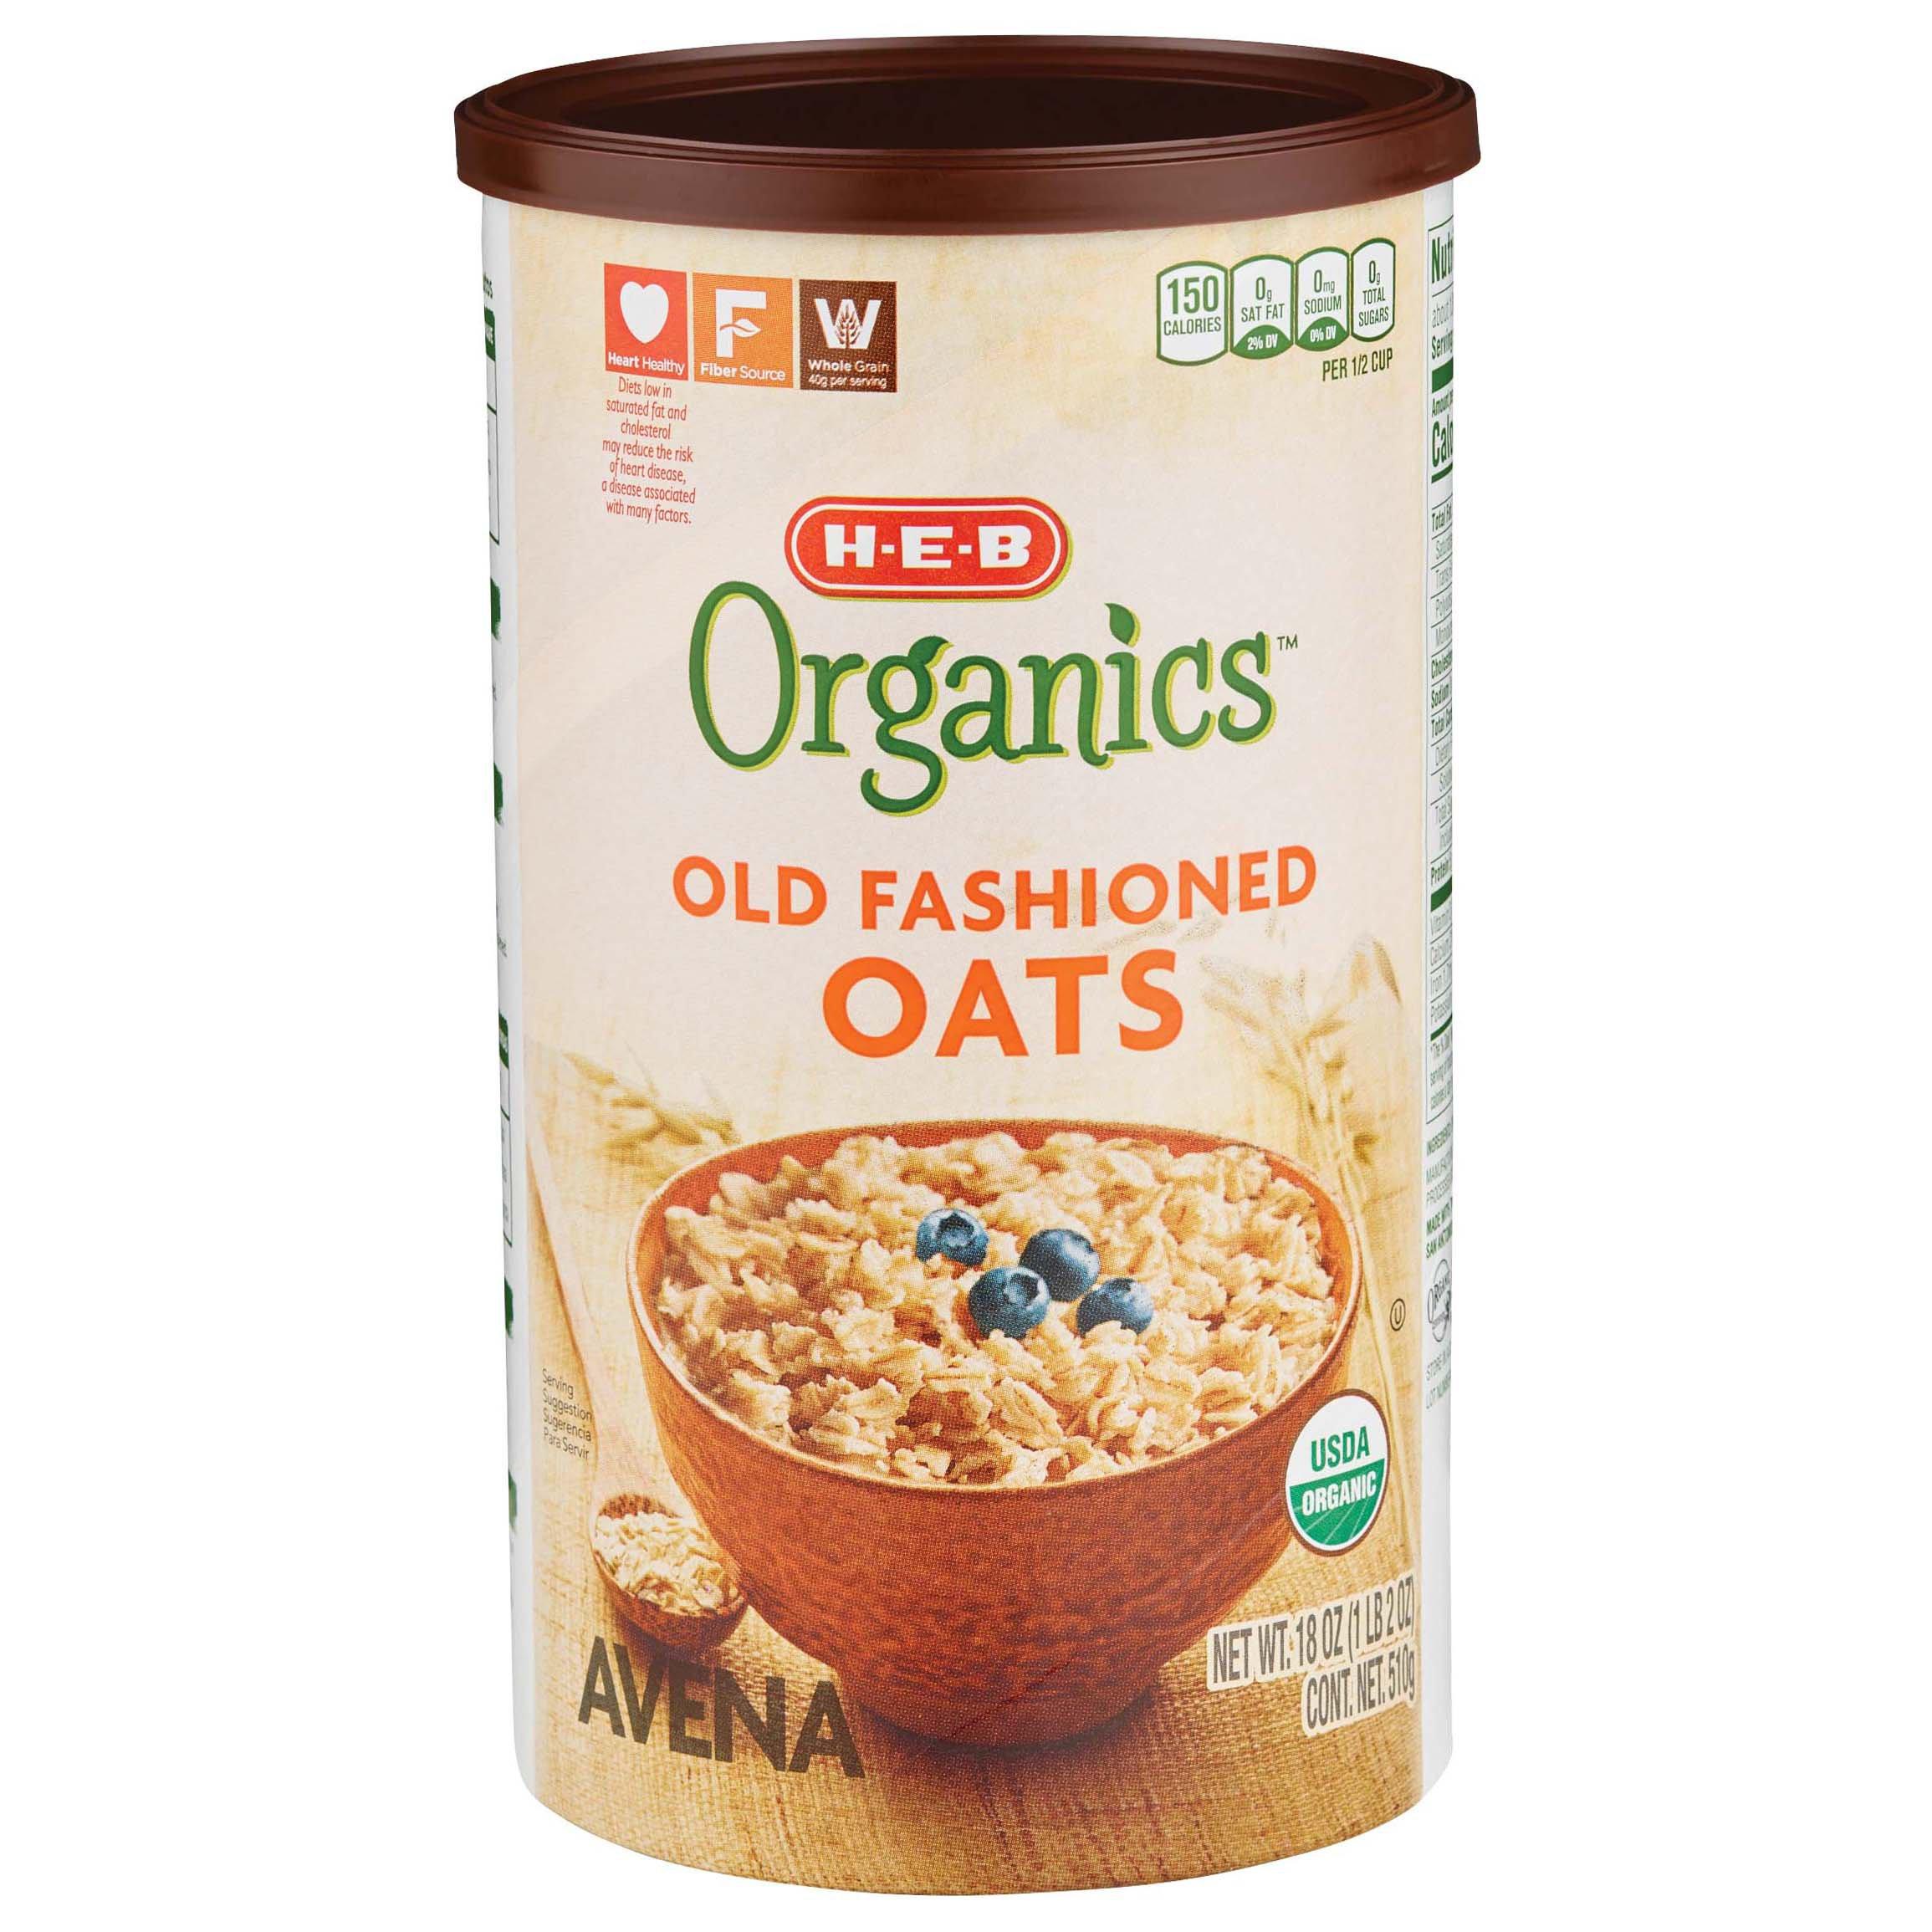 H-E-B Organics Old Fashioned Oats